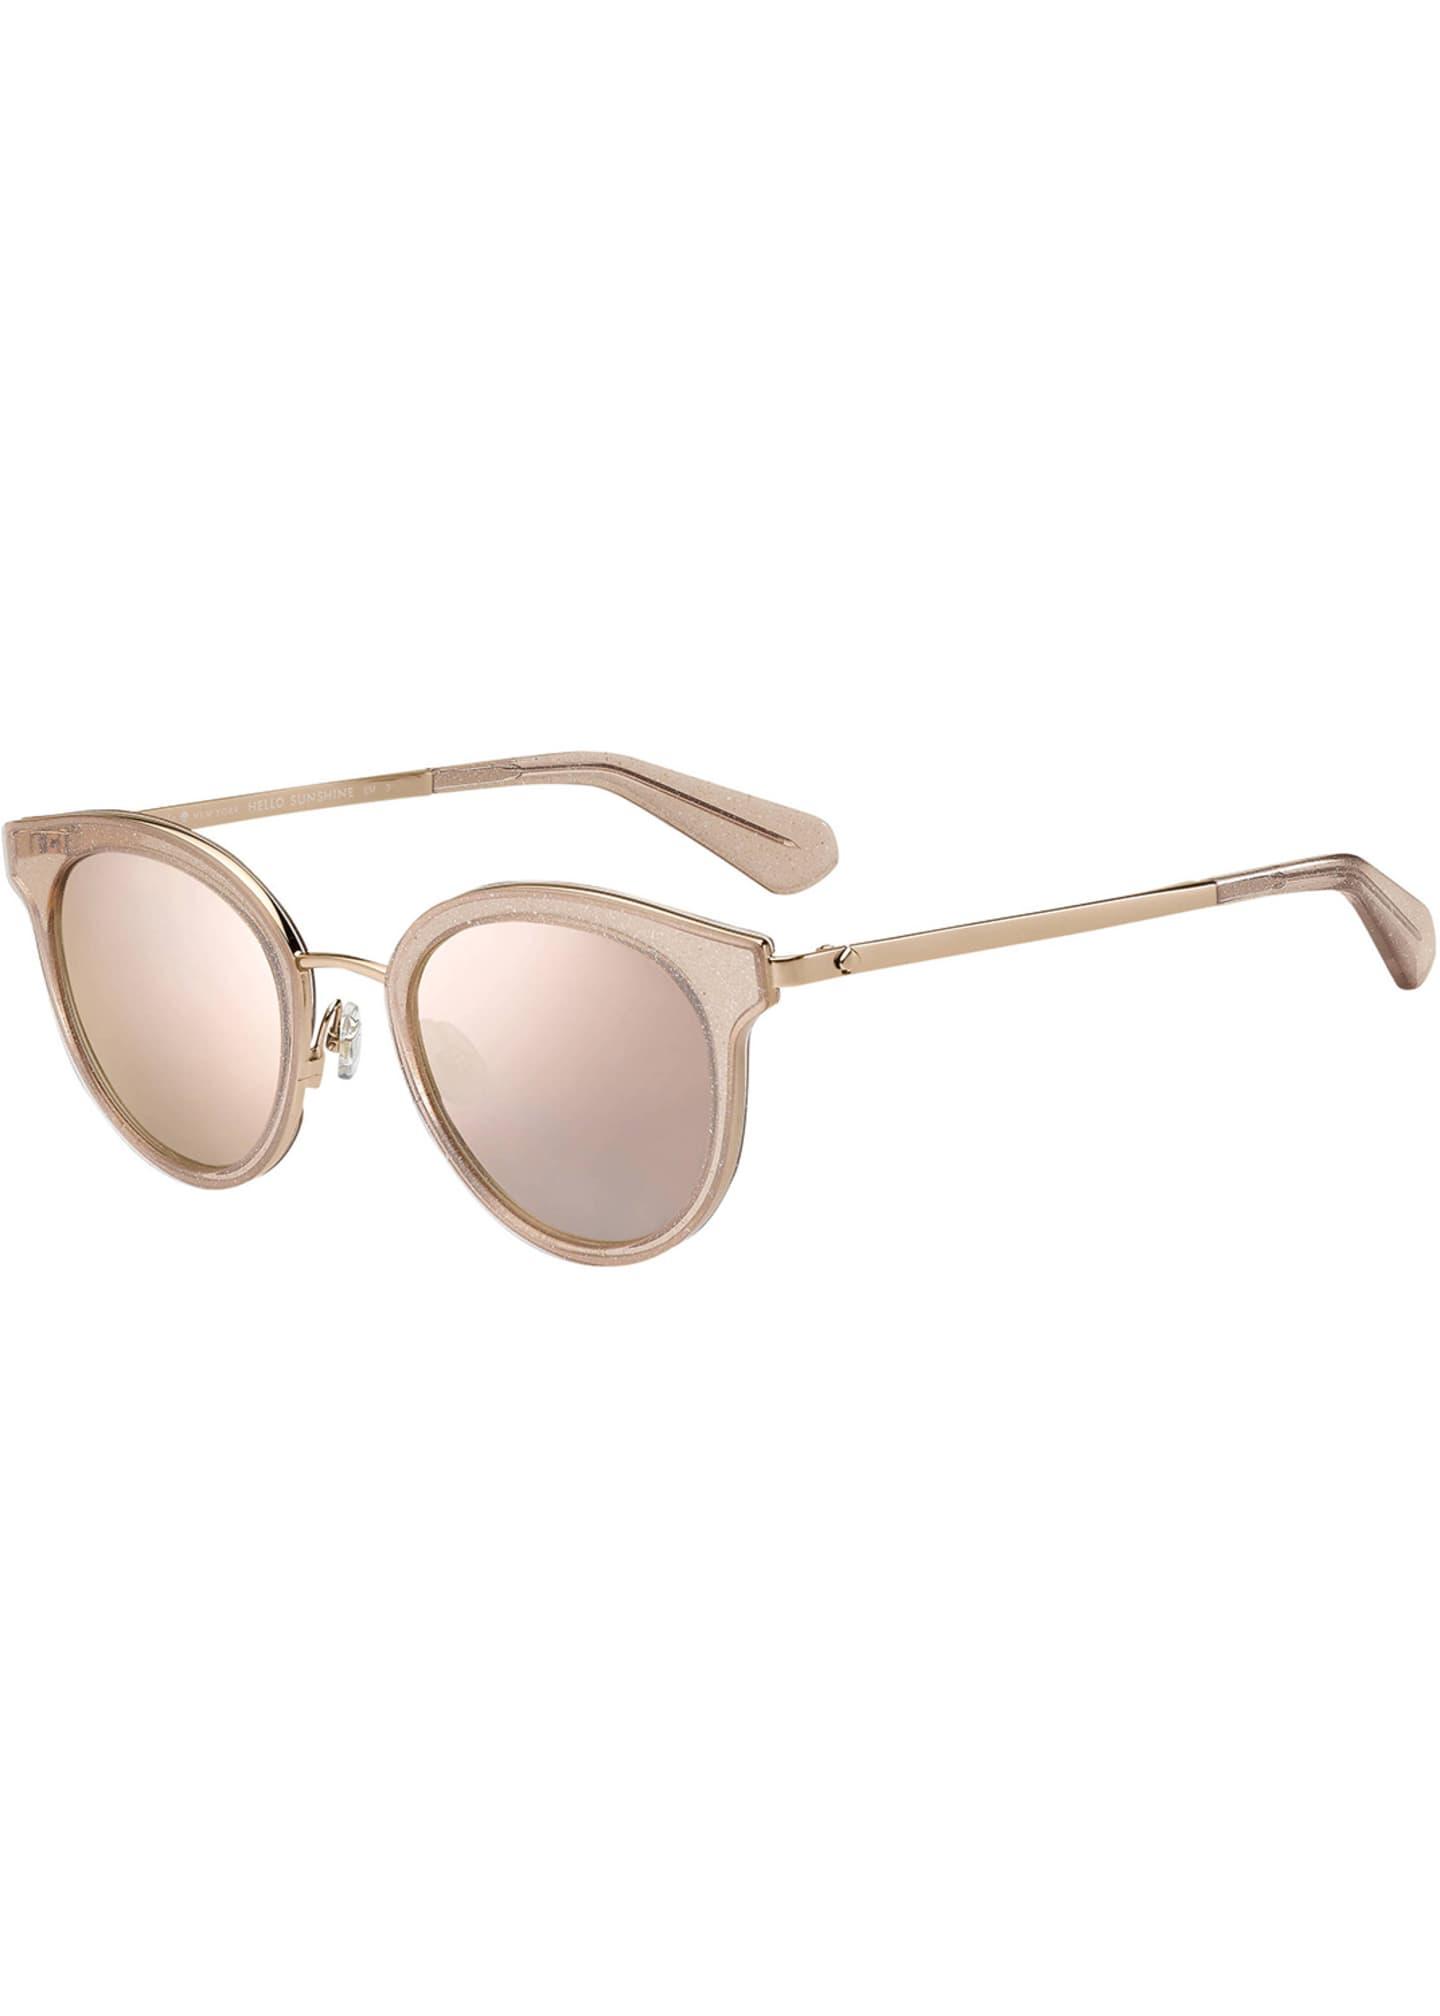 kate spade new york lisannefs round mirrored sunglasses